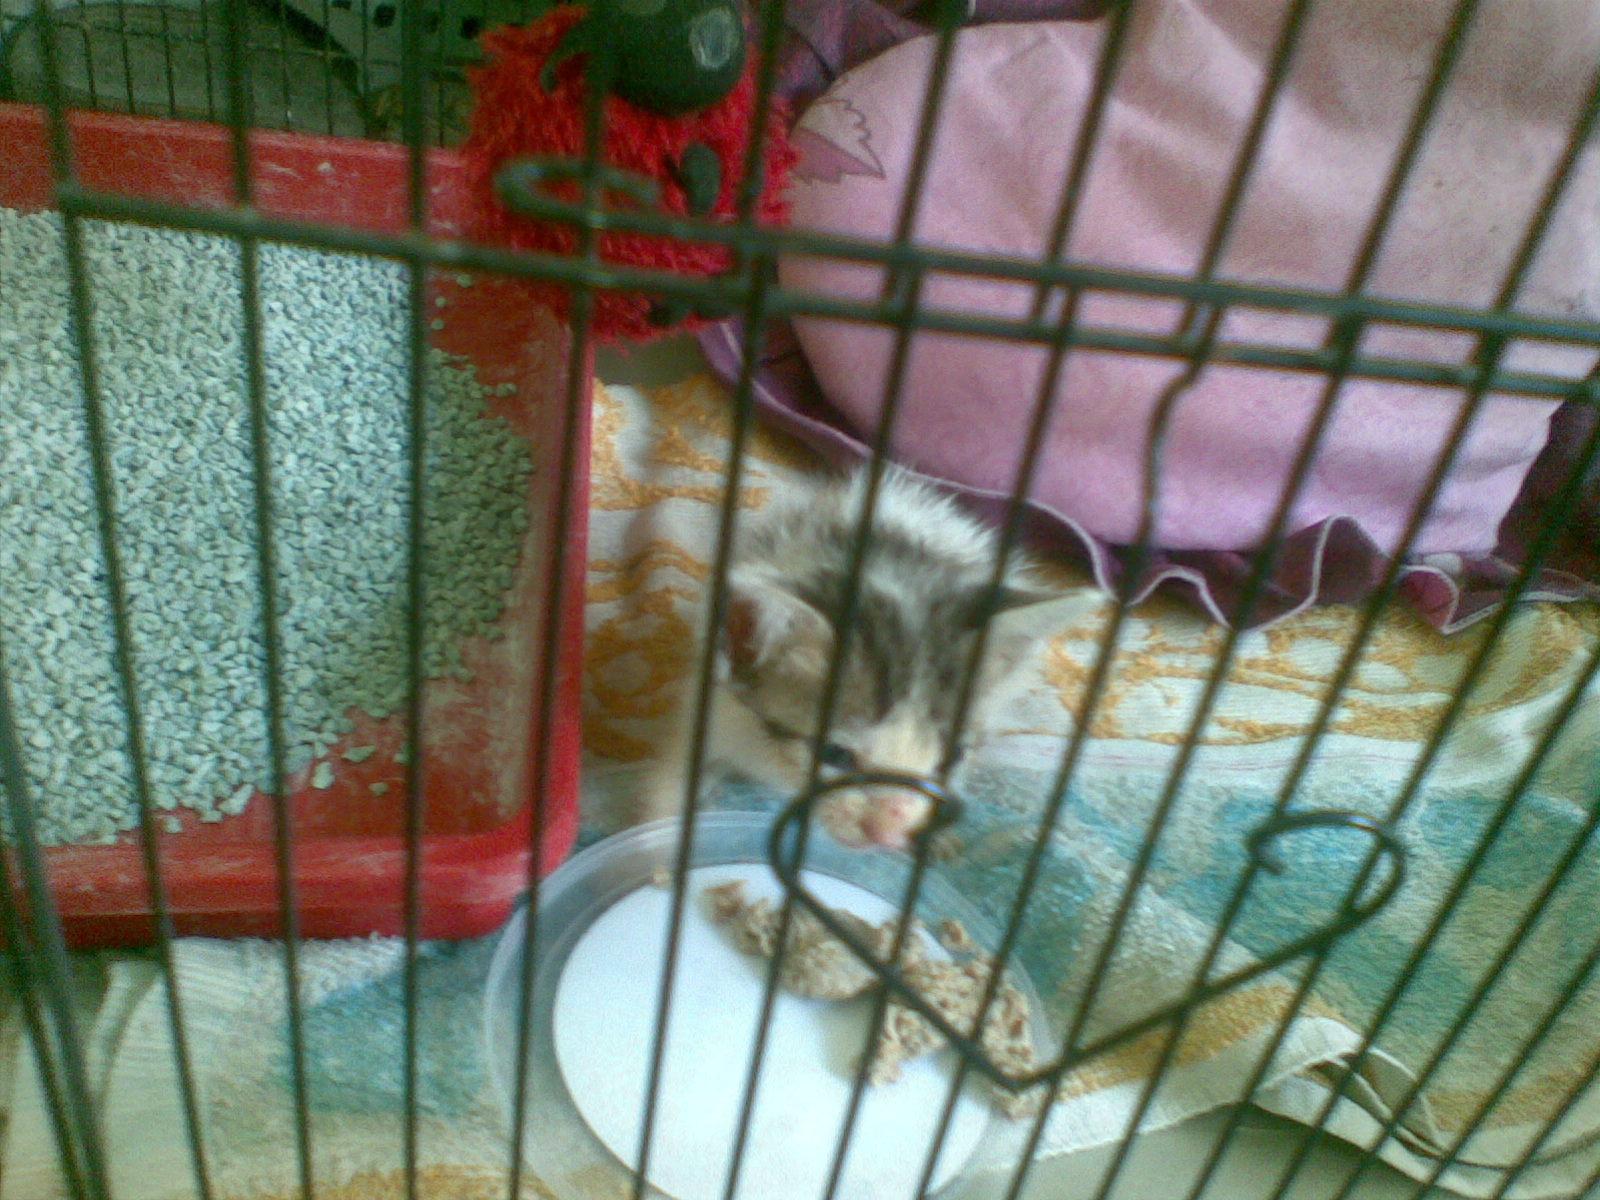 Krucil: Kucing yang kembali ke rumah setelah seminggu dibuang ke pasar